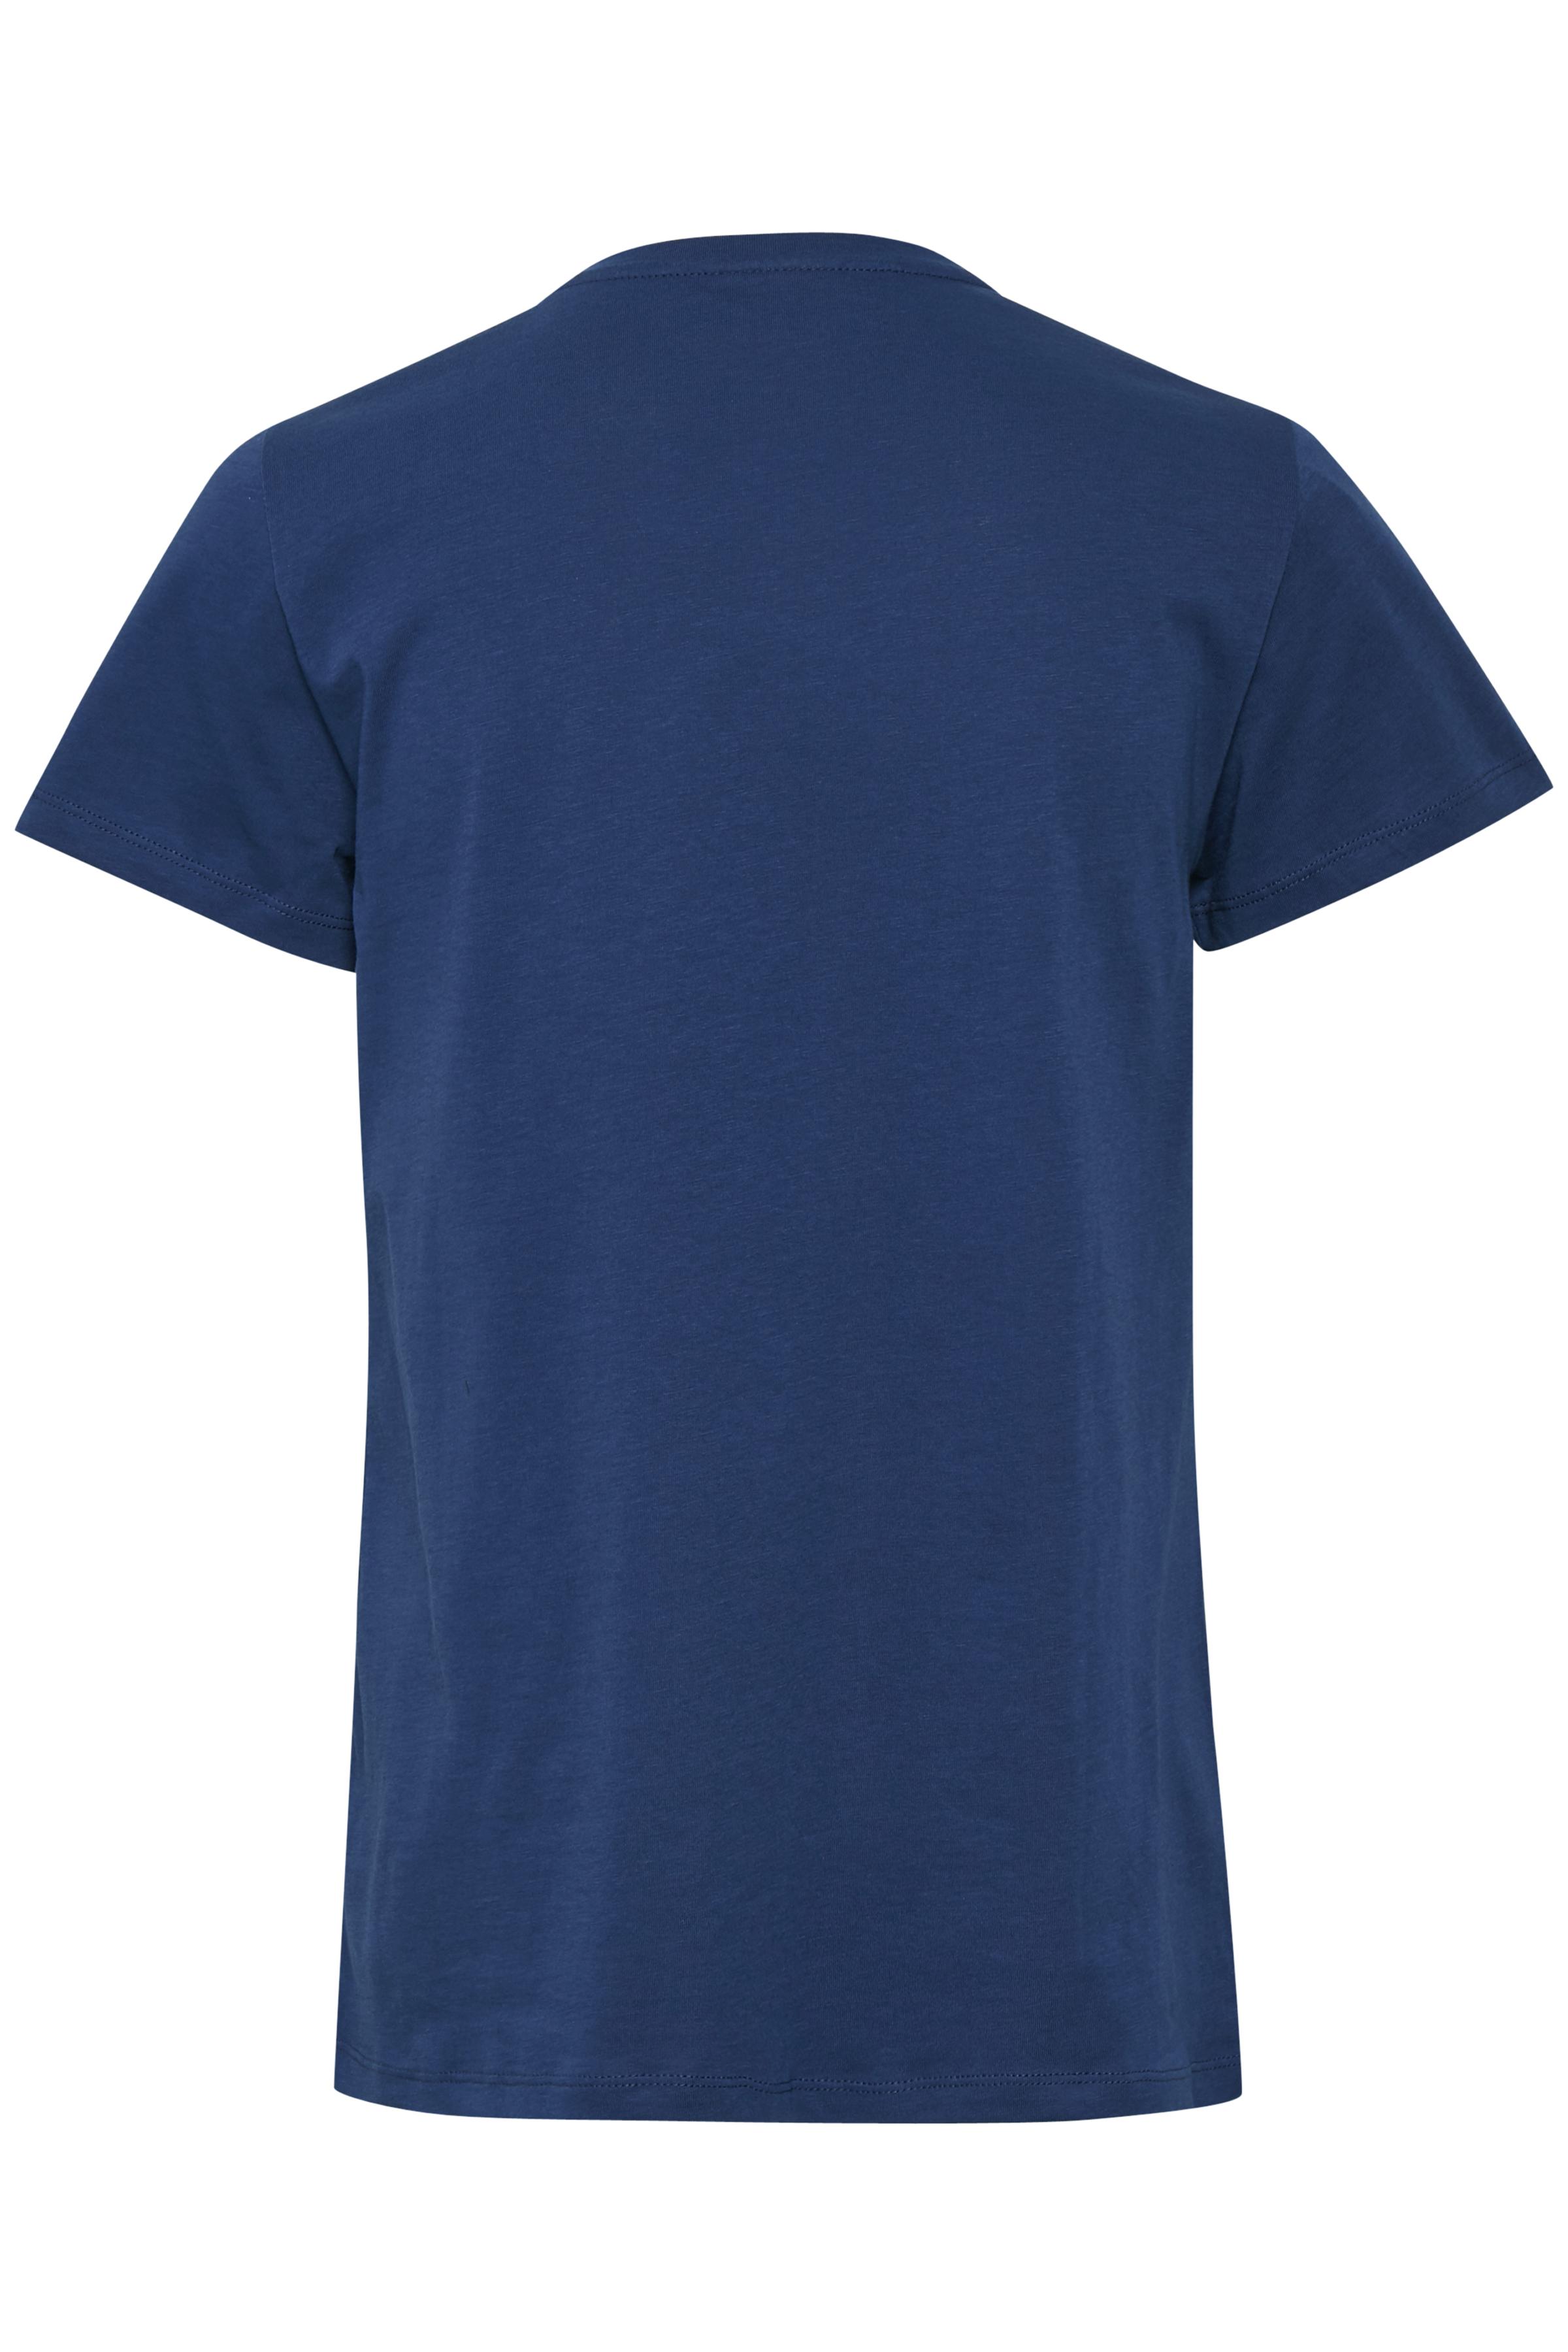 Kobaltblau Kurzarm T-Shirt von Kaffe – Shoppen Sie Kobaltblau Kurzarm T-Shirt ab Gr. XS-XXL hier